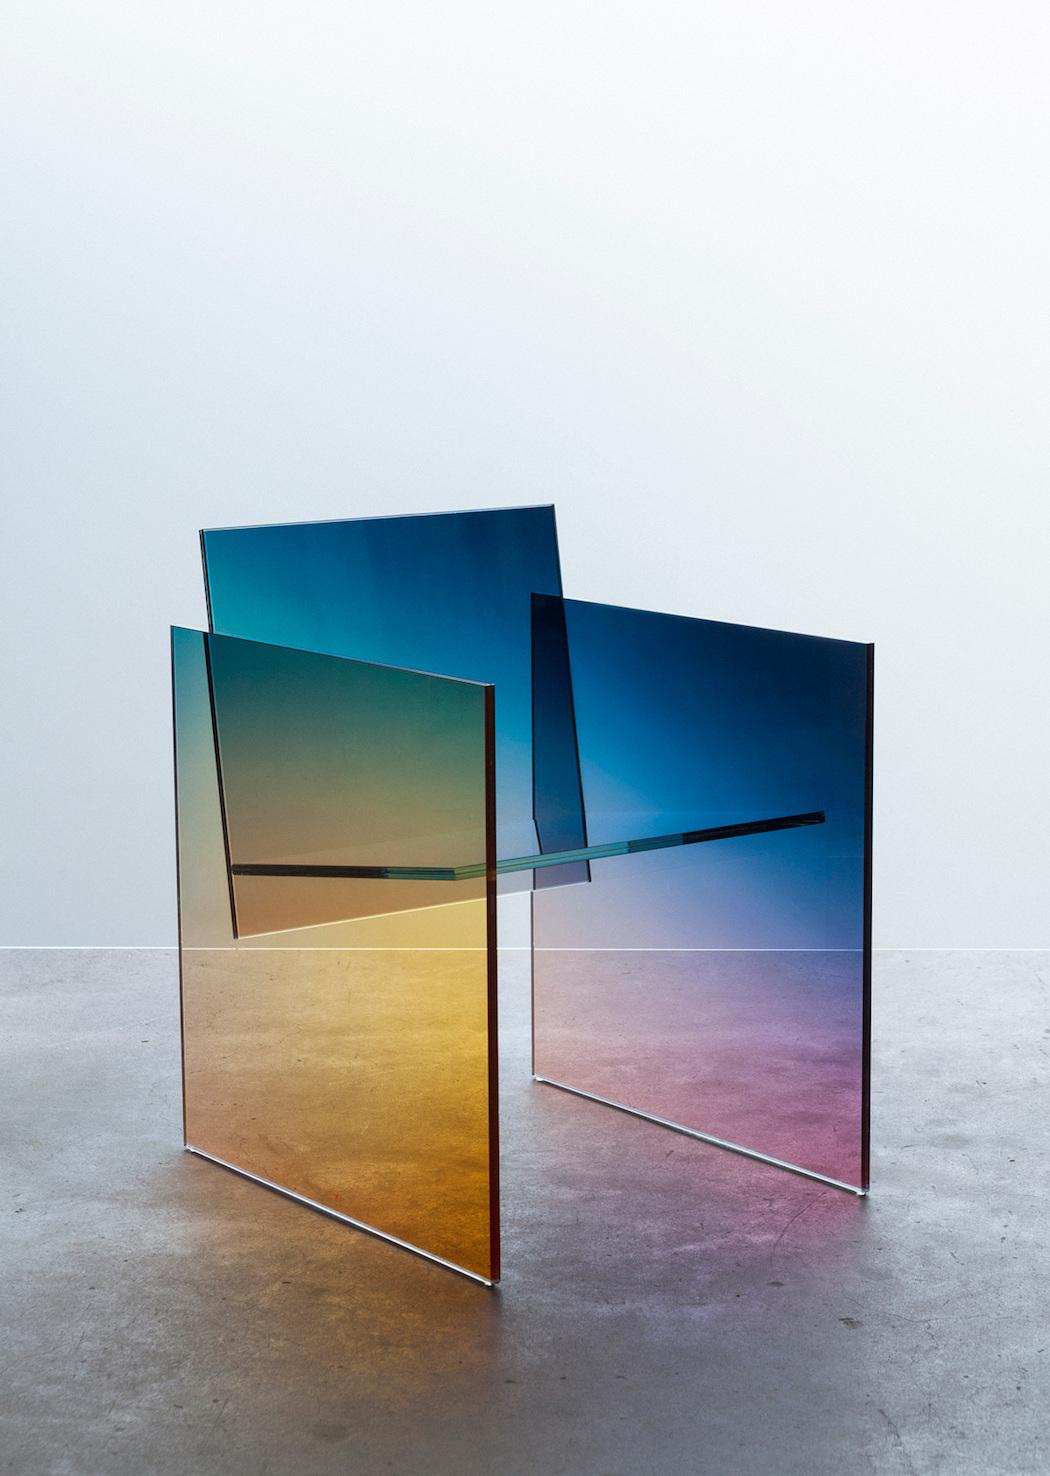 Colored Glass Chair by Germans Ermics – Fubiz Media Design